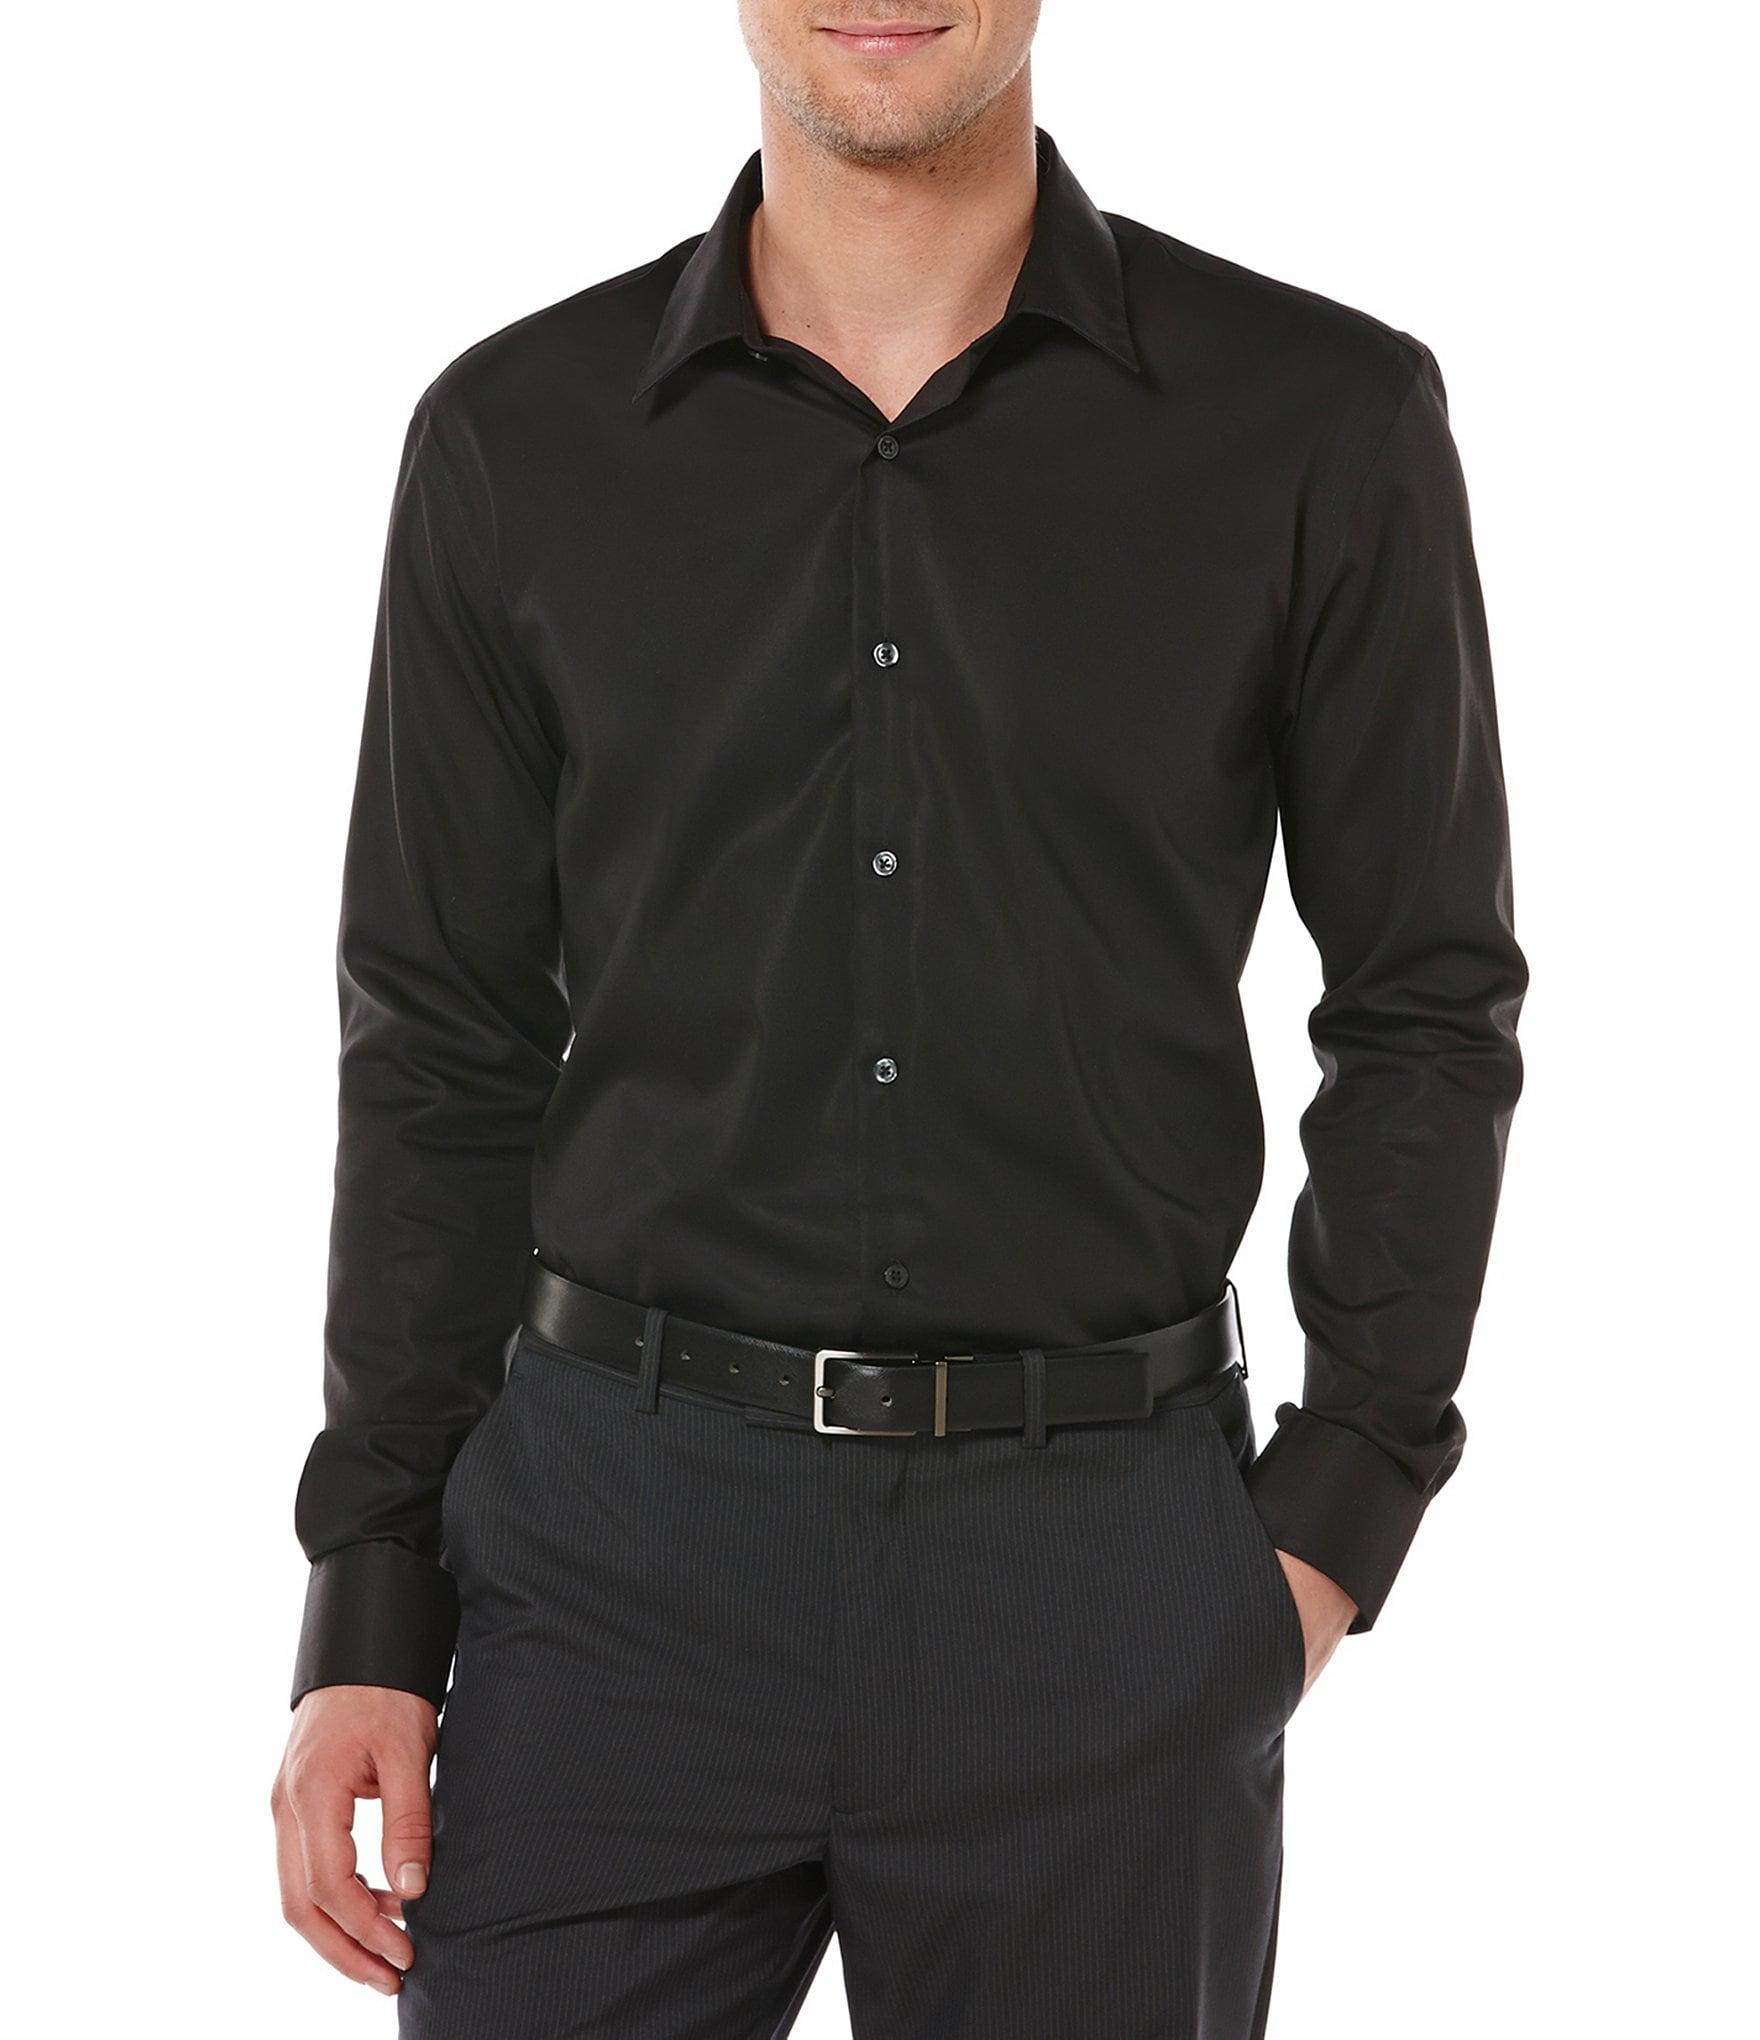 Perry Ellis Mens Dress Shirts